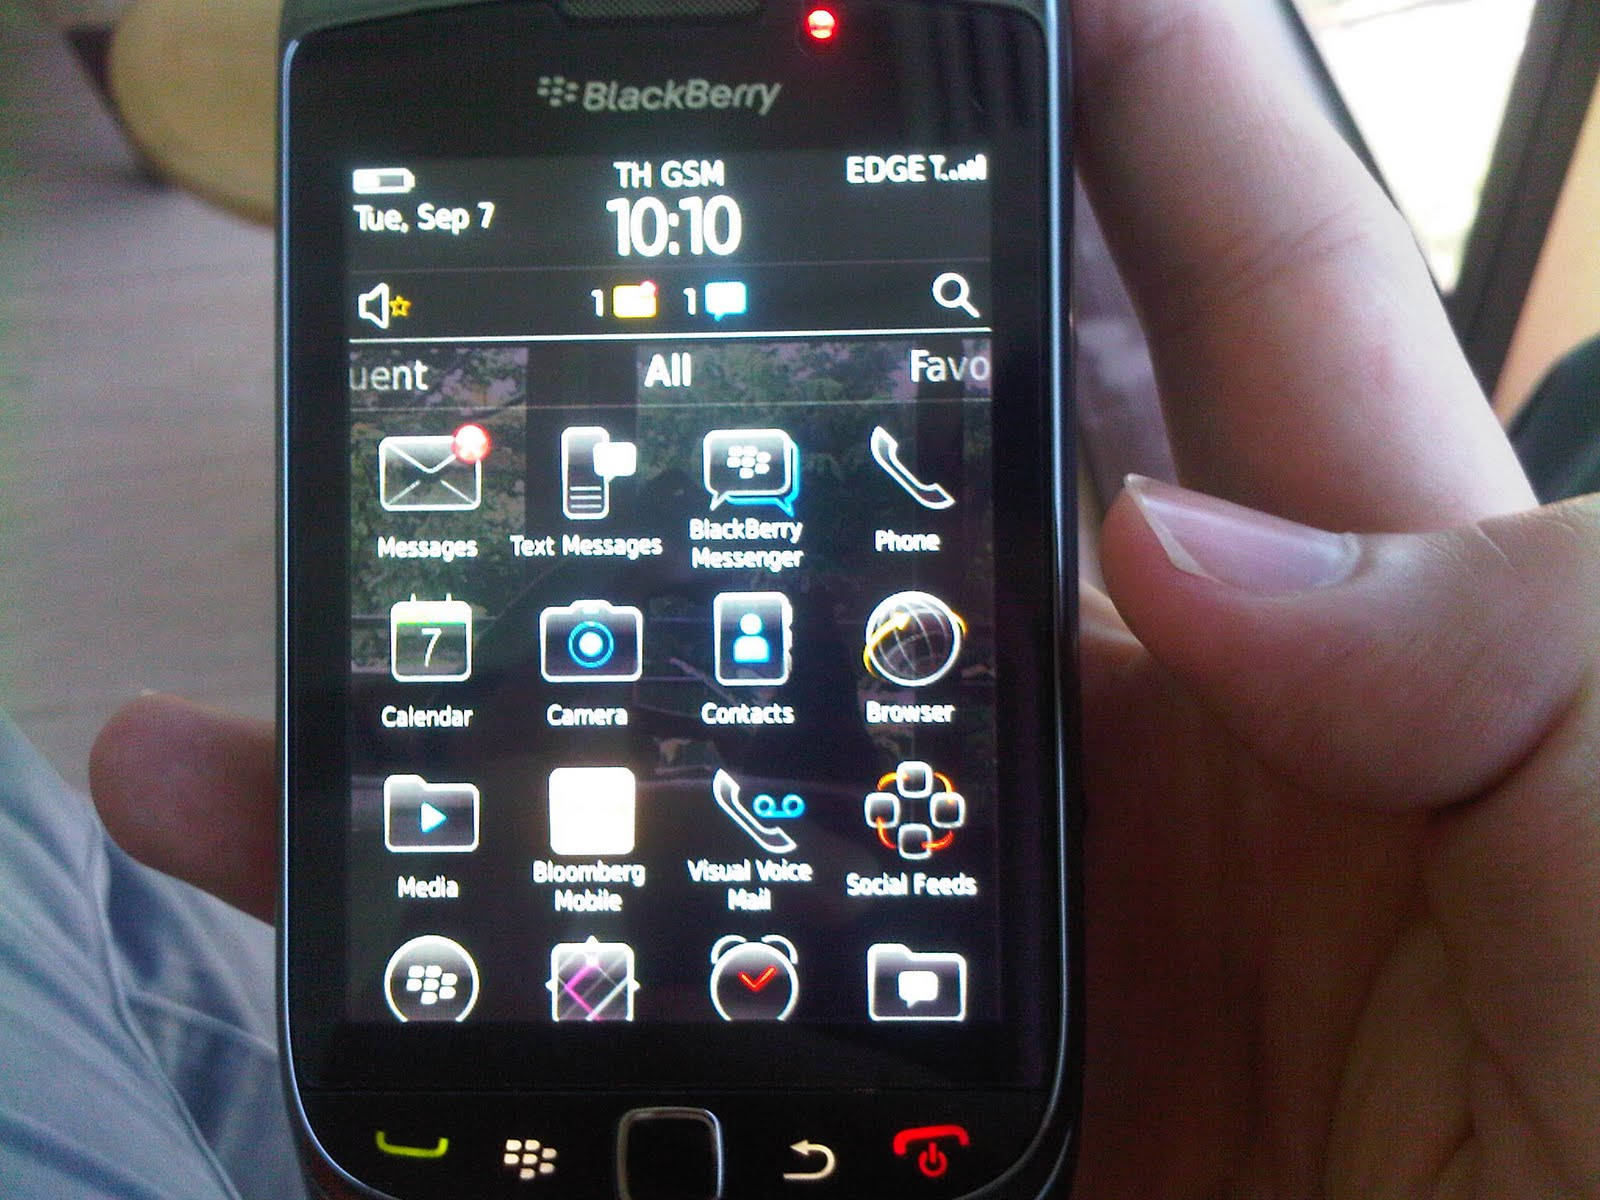 http://3.bp.blogspot.com/_rQUwGQsZx-Y/TJh9r6R9wdI/AAAAAAAAAgA/L1_XD4oI4Tw/s1600/blackberry-torch-9800-features-03.jpg